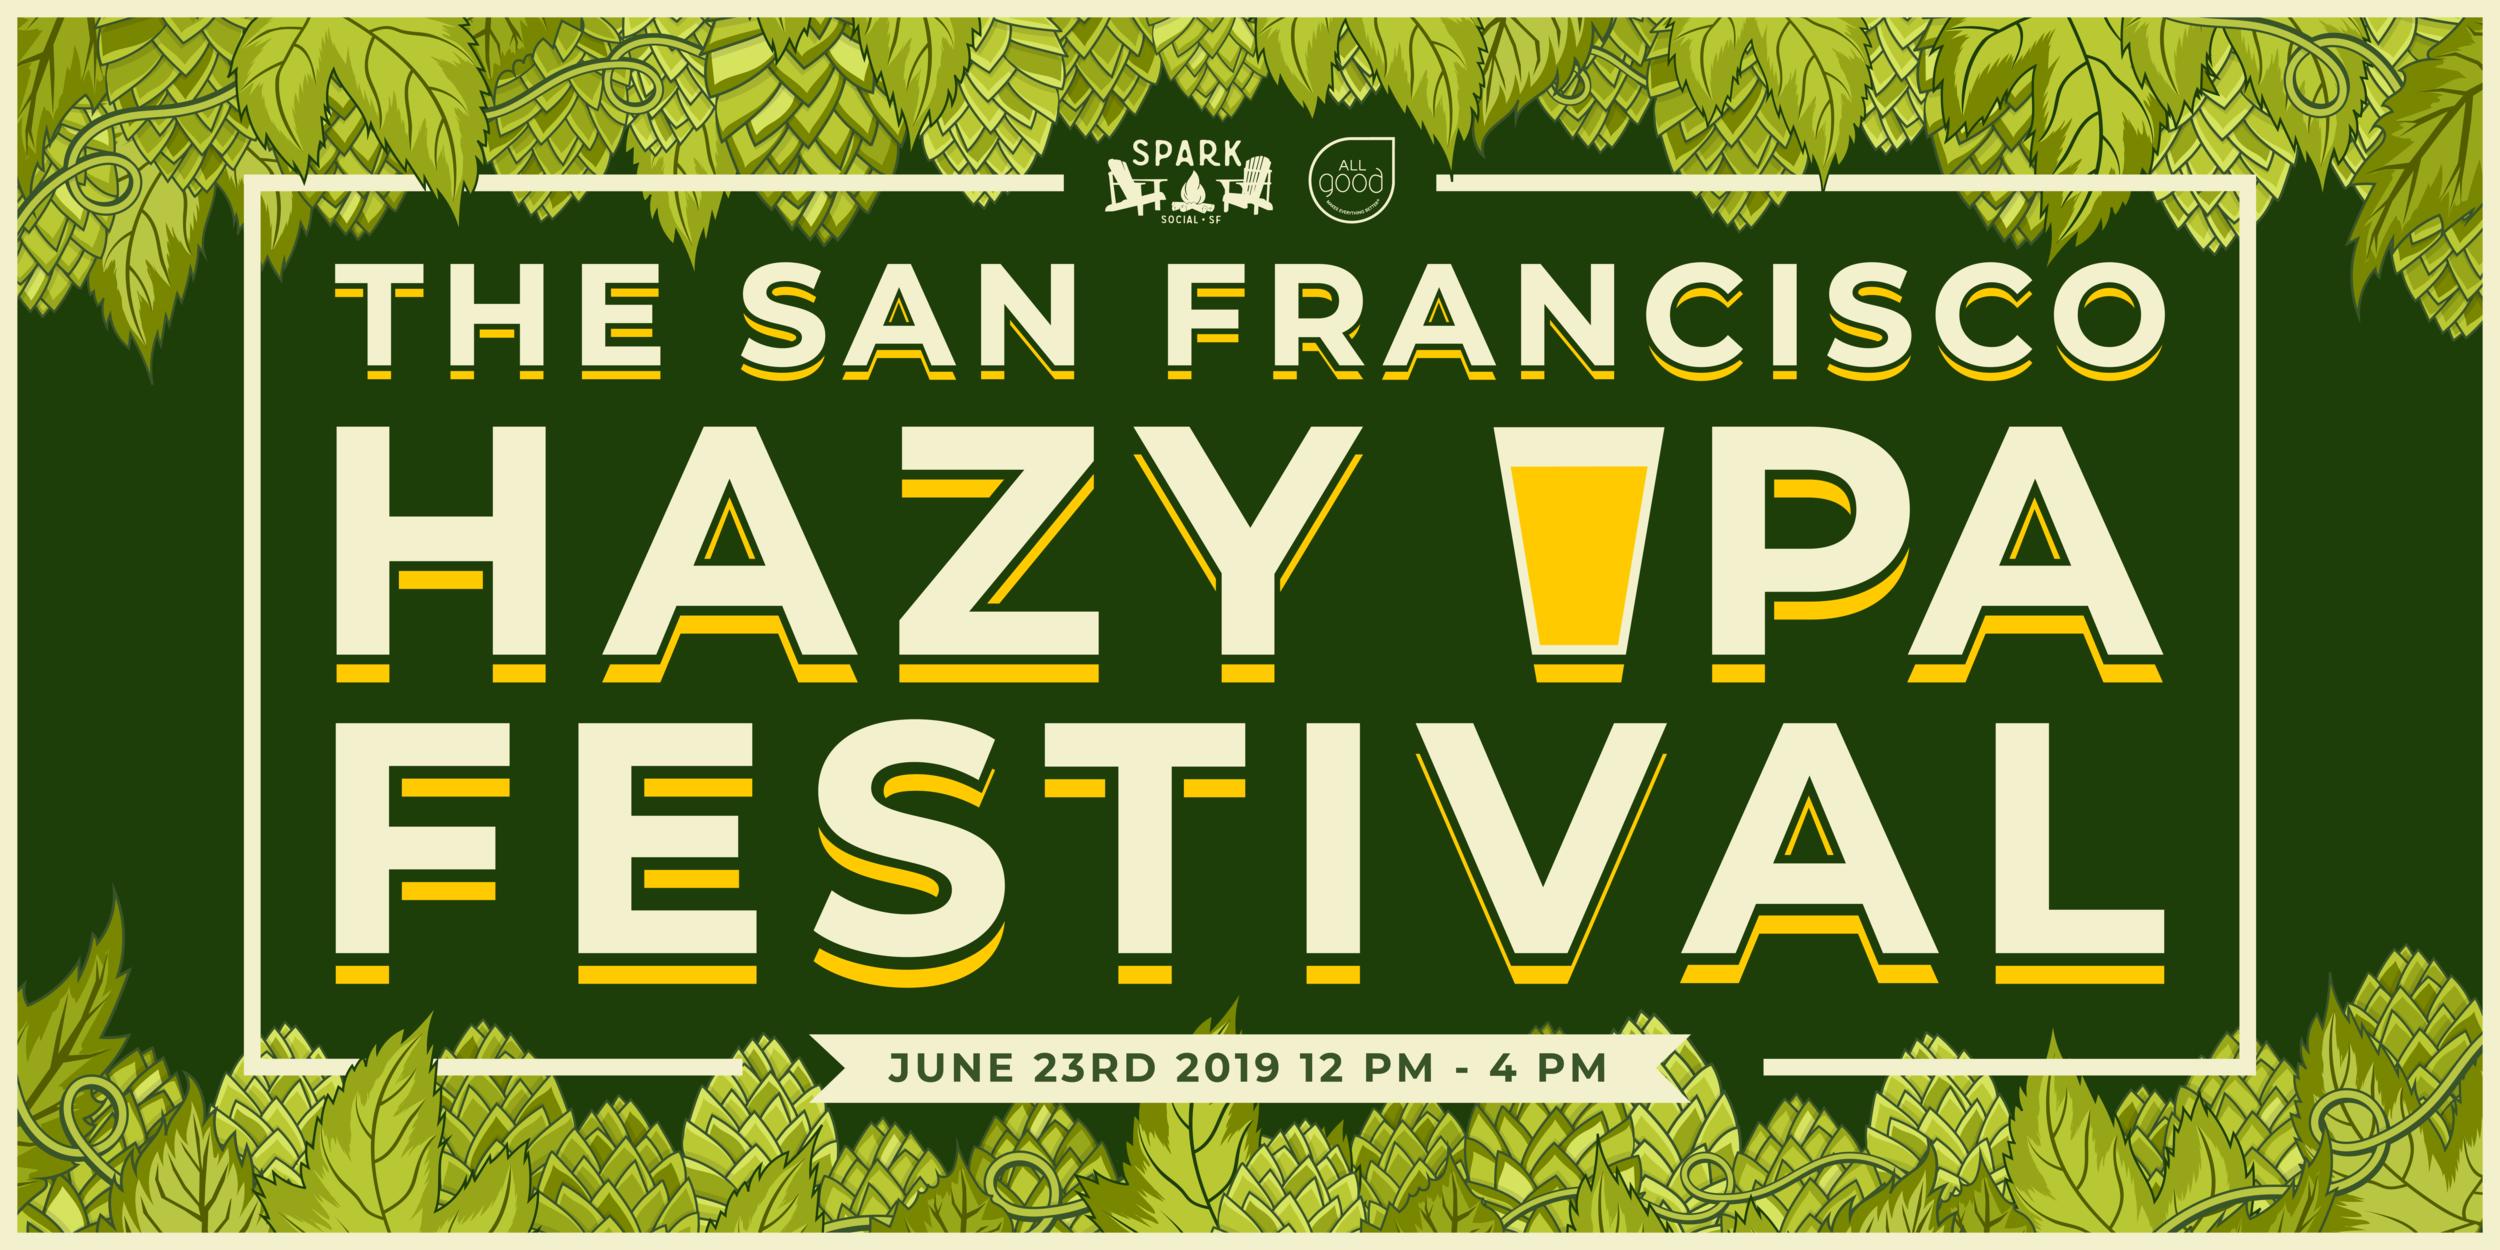 hazyfest-2019-event-2logos-01.png